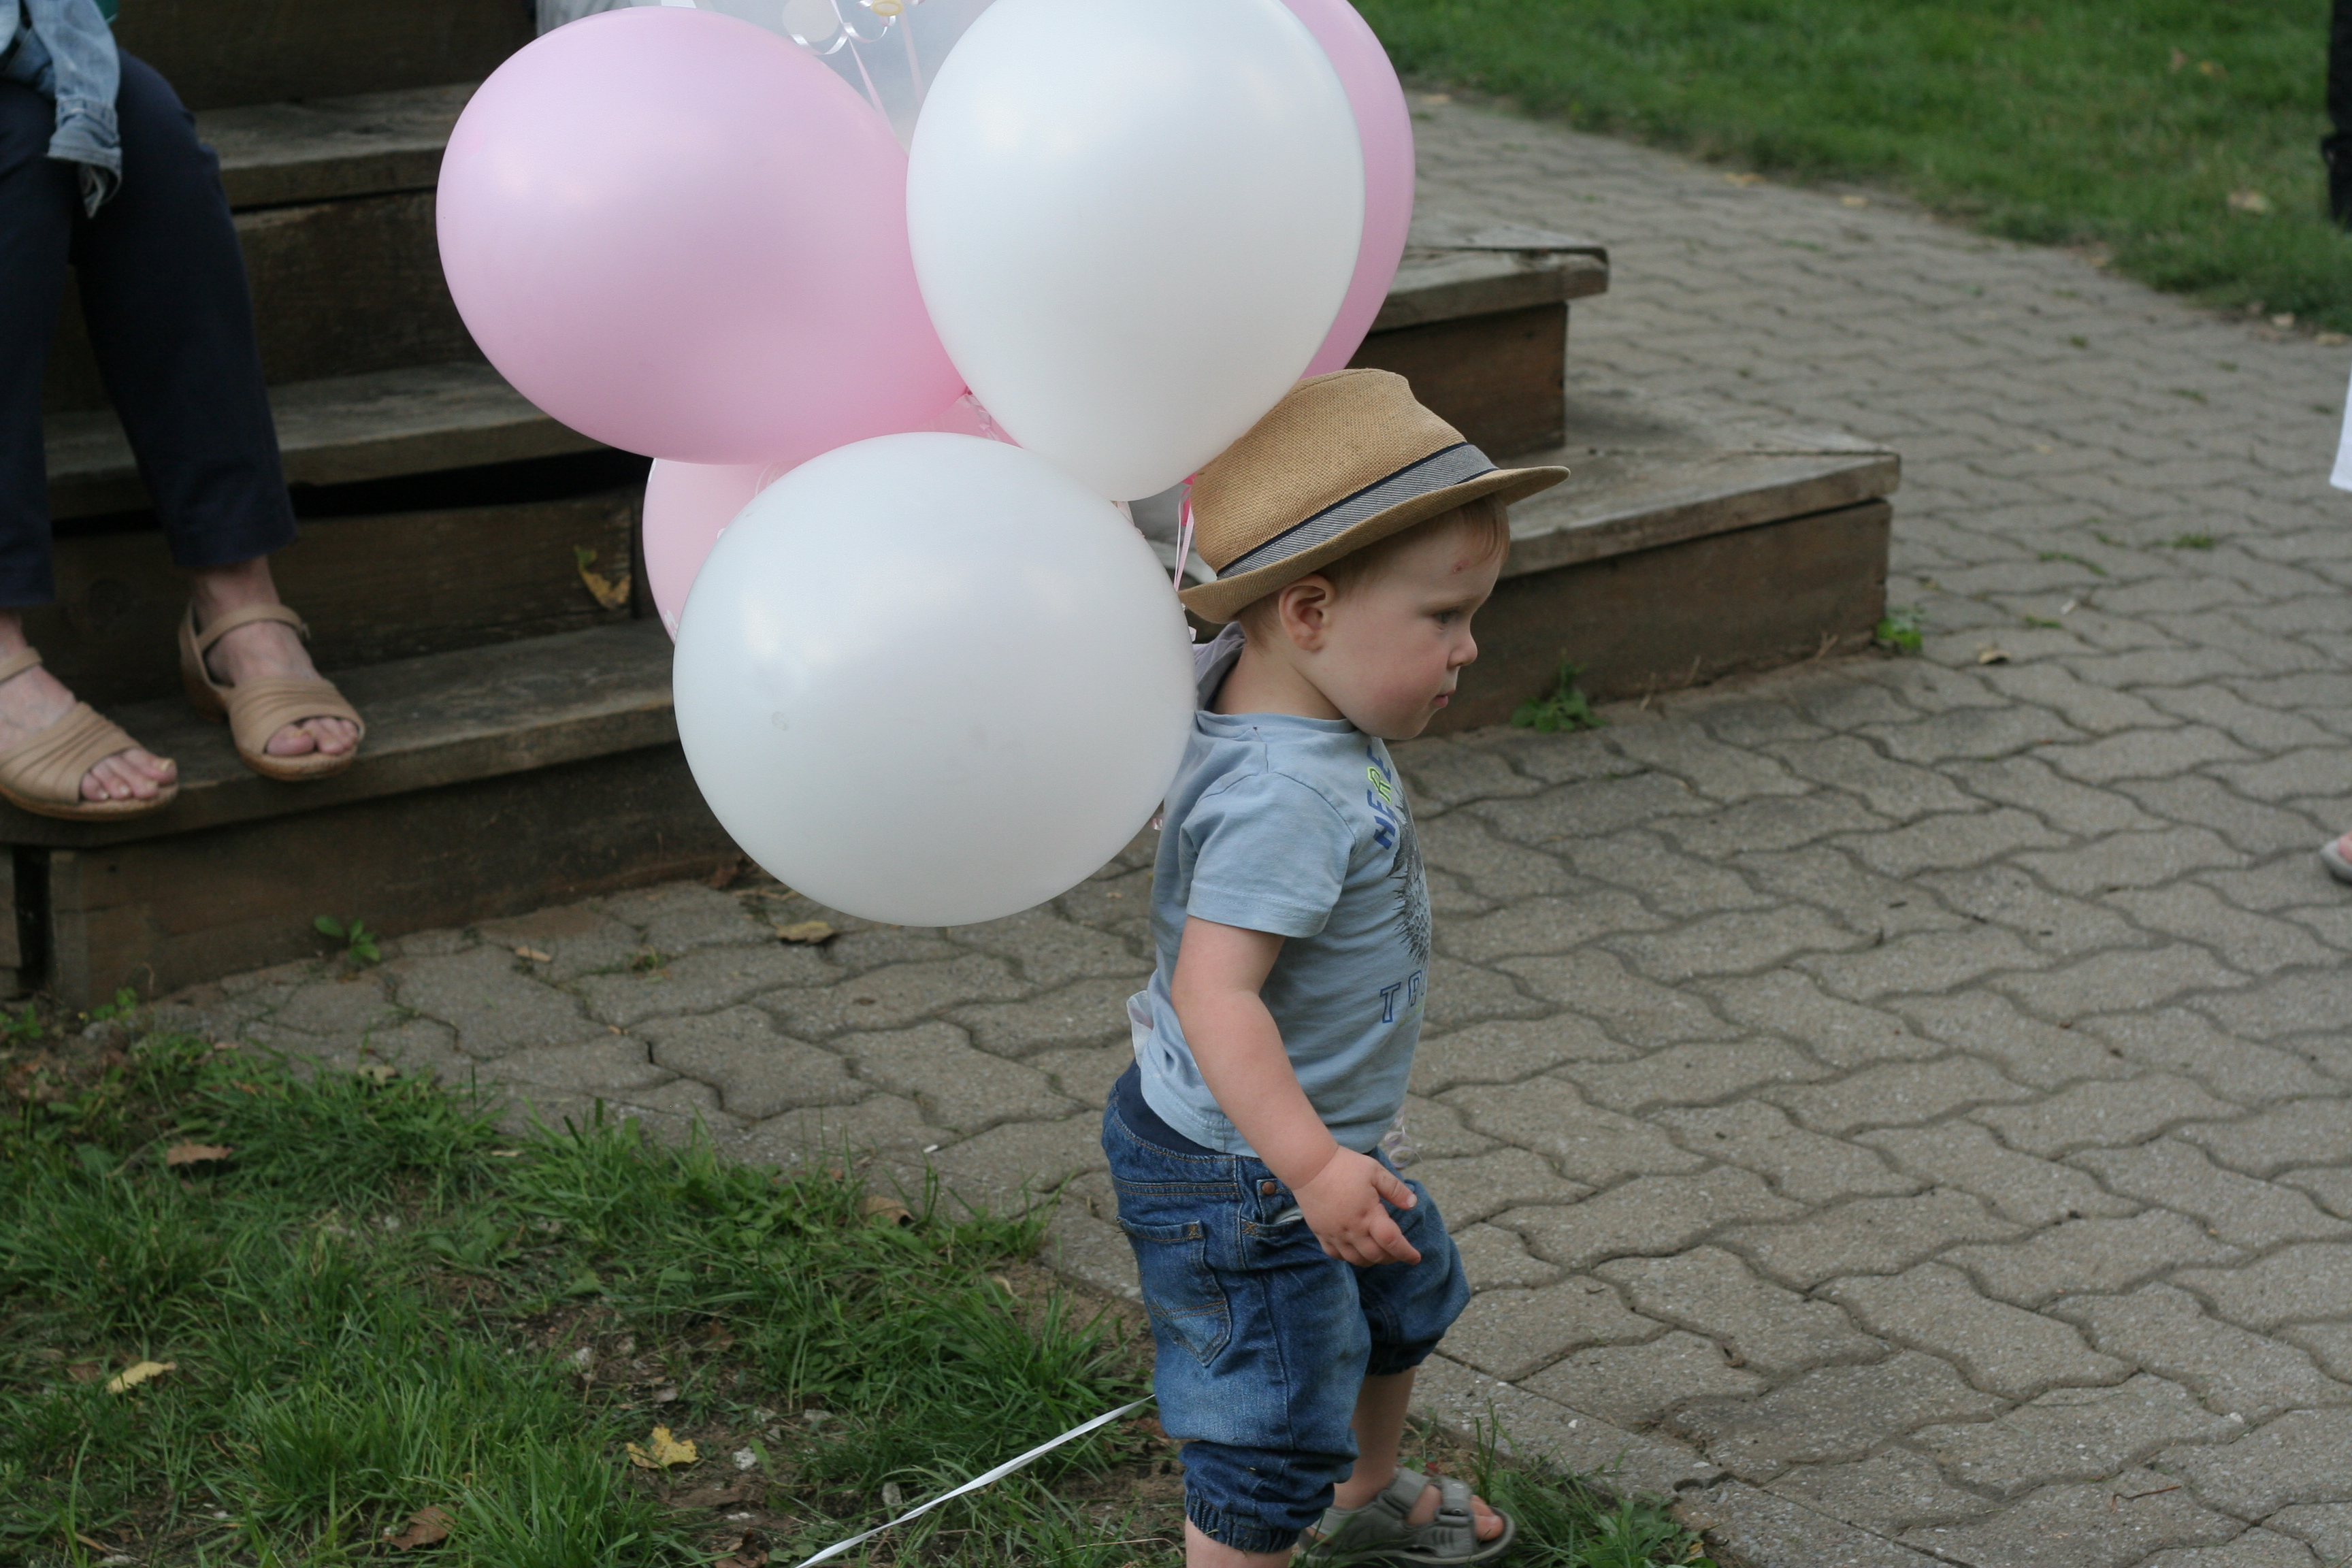 mp carle shower bébé ballons rose